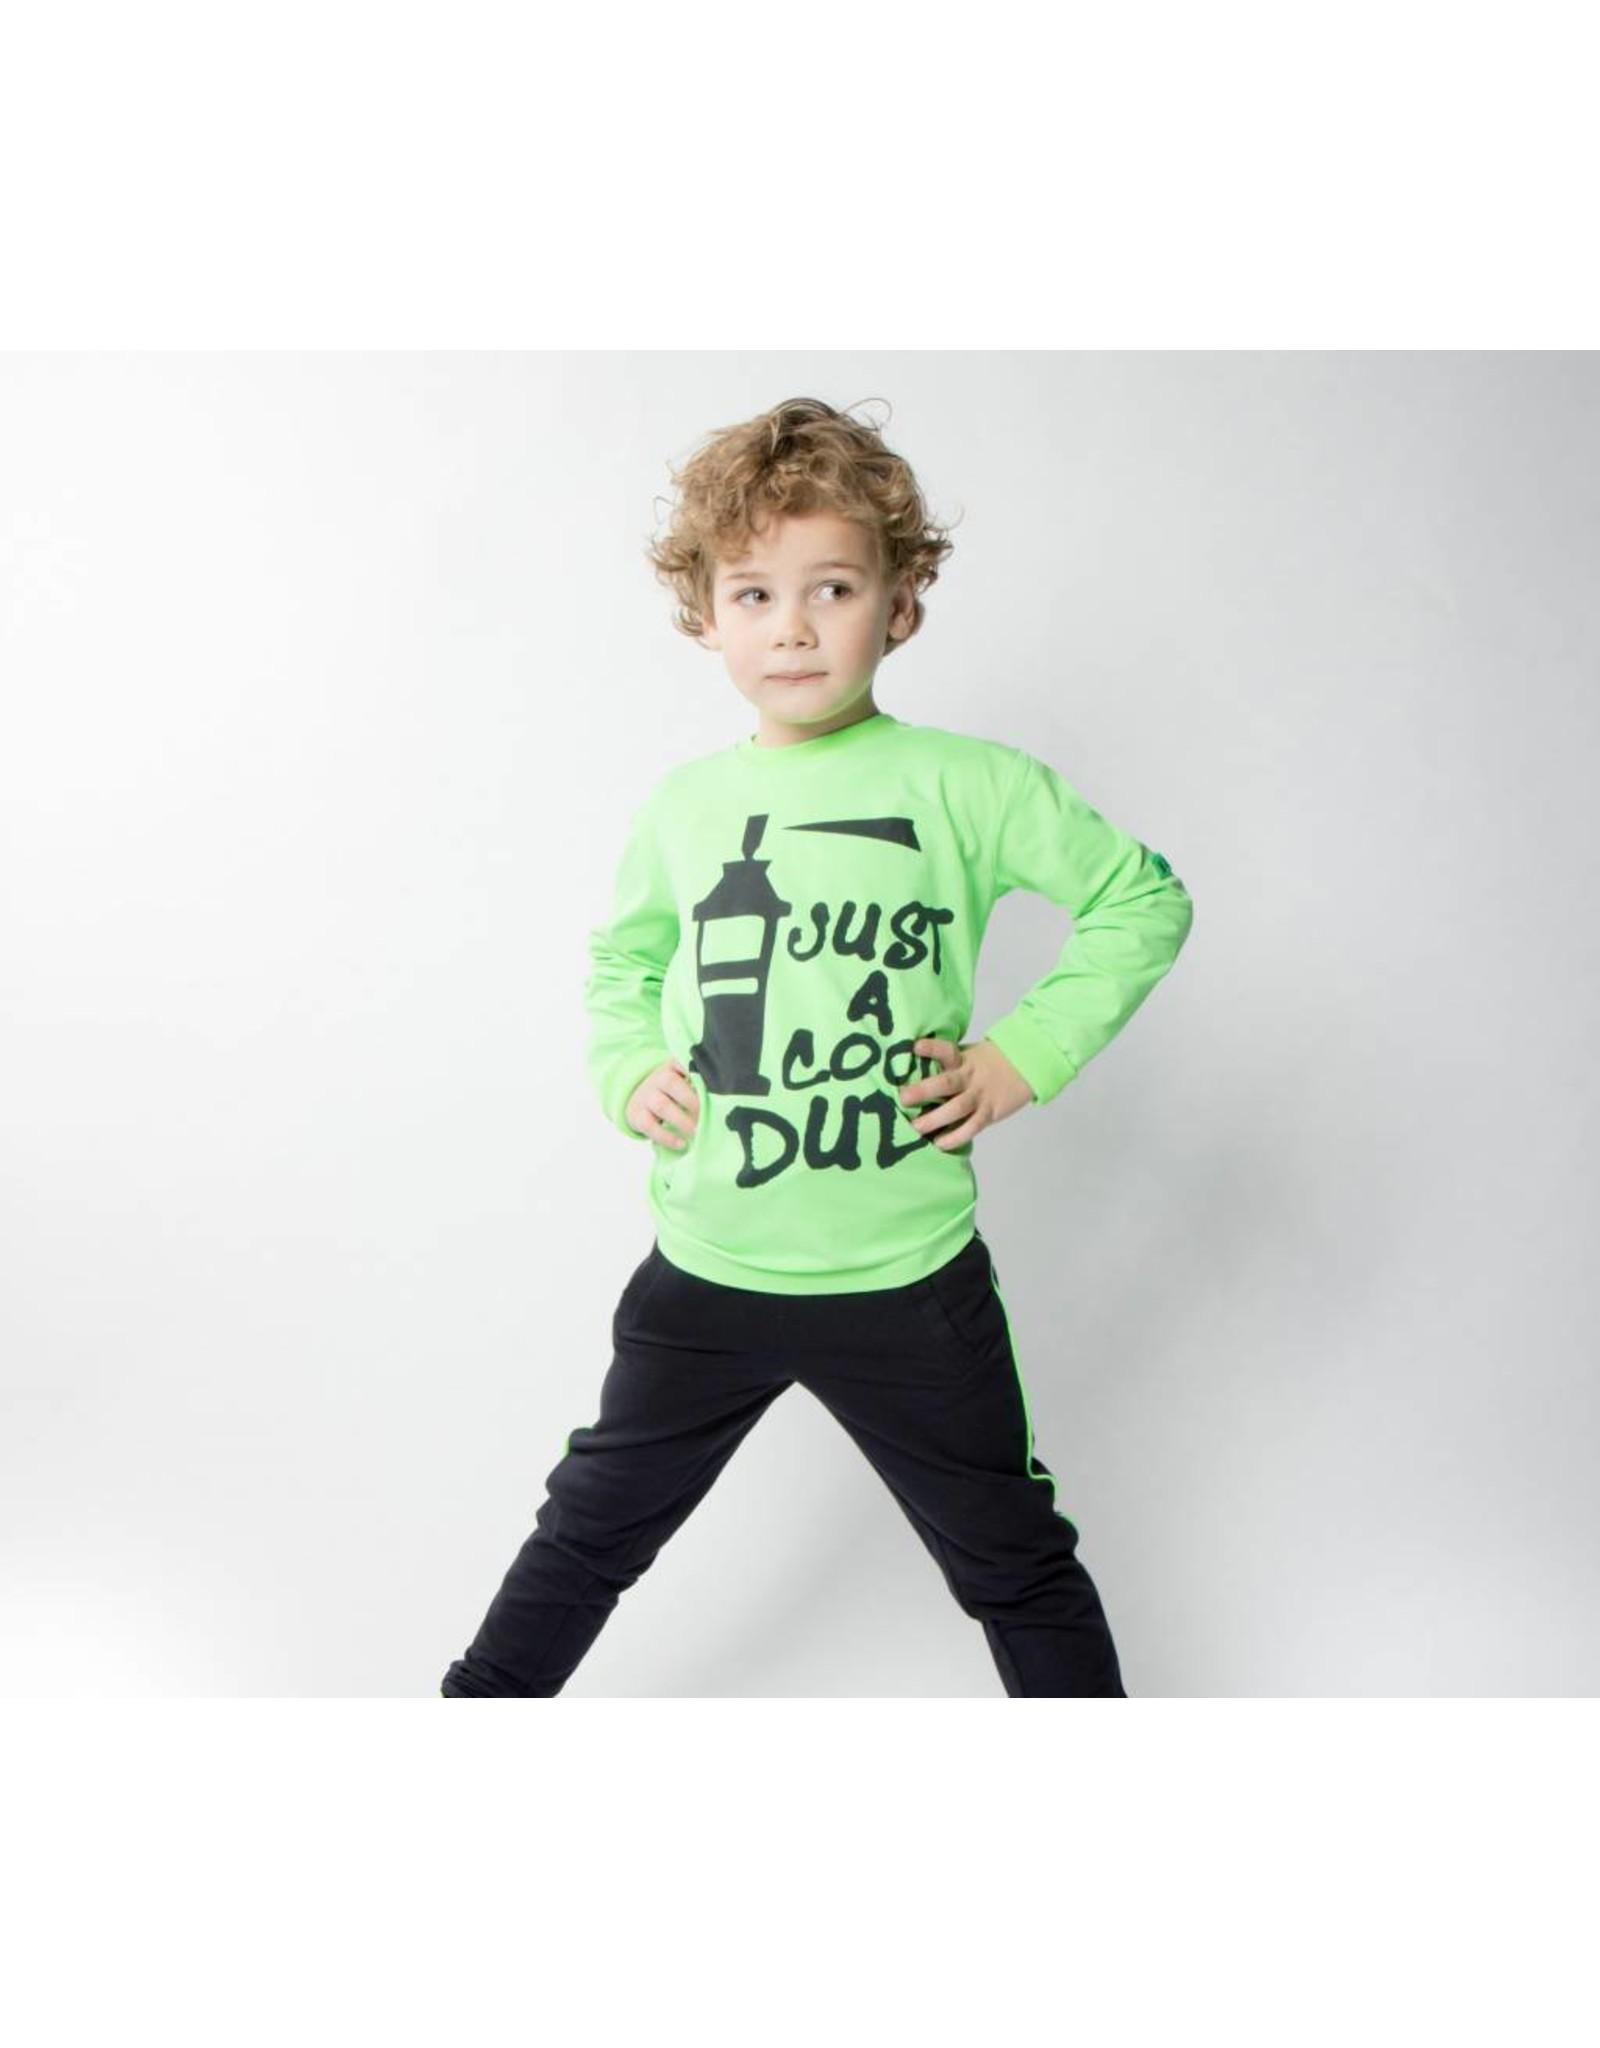 B'Chill B'Chill shirt Cool Dude